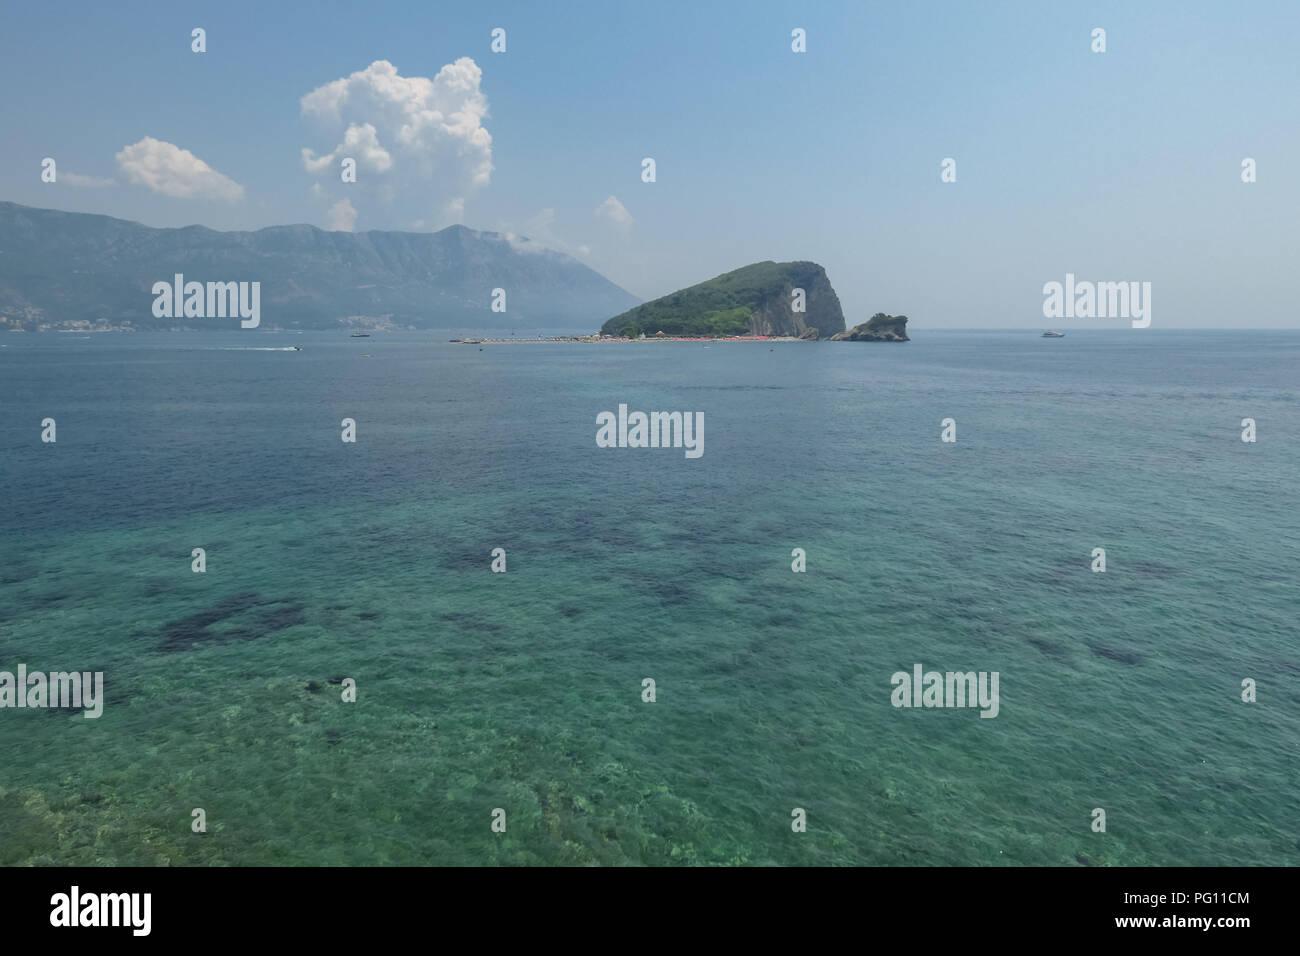 St Nicholas Island - Sveti Nikola Island - in the Southern Adriatic, Budva, Montenegro - Stock Image